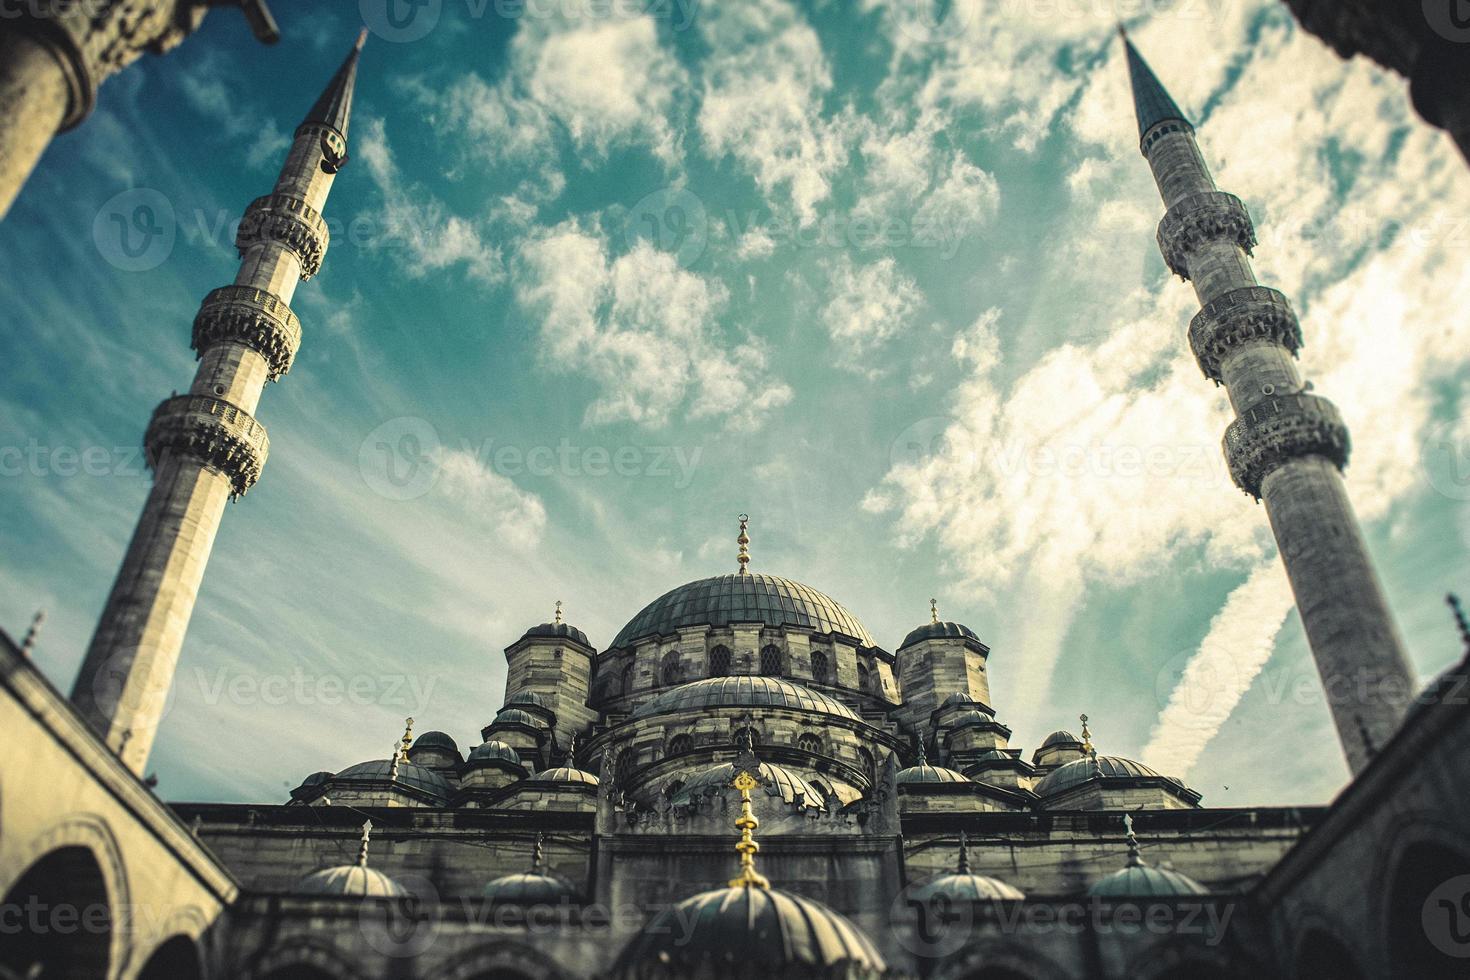 Istanbul Bosphorus Mosque Yeni Cami Mosque photo